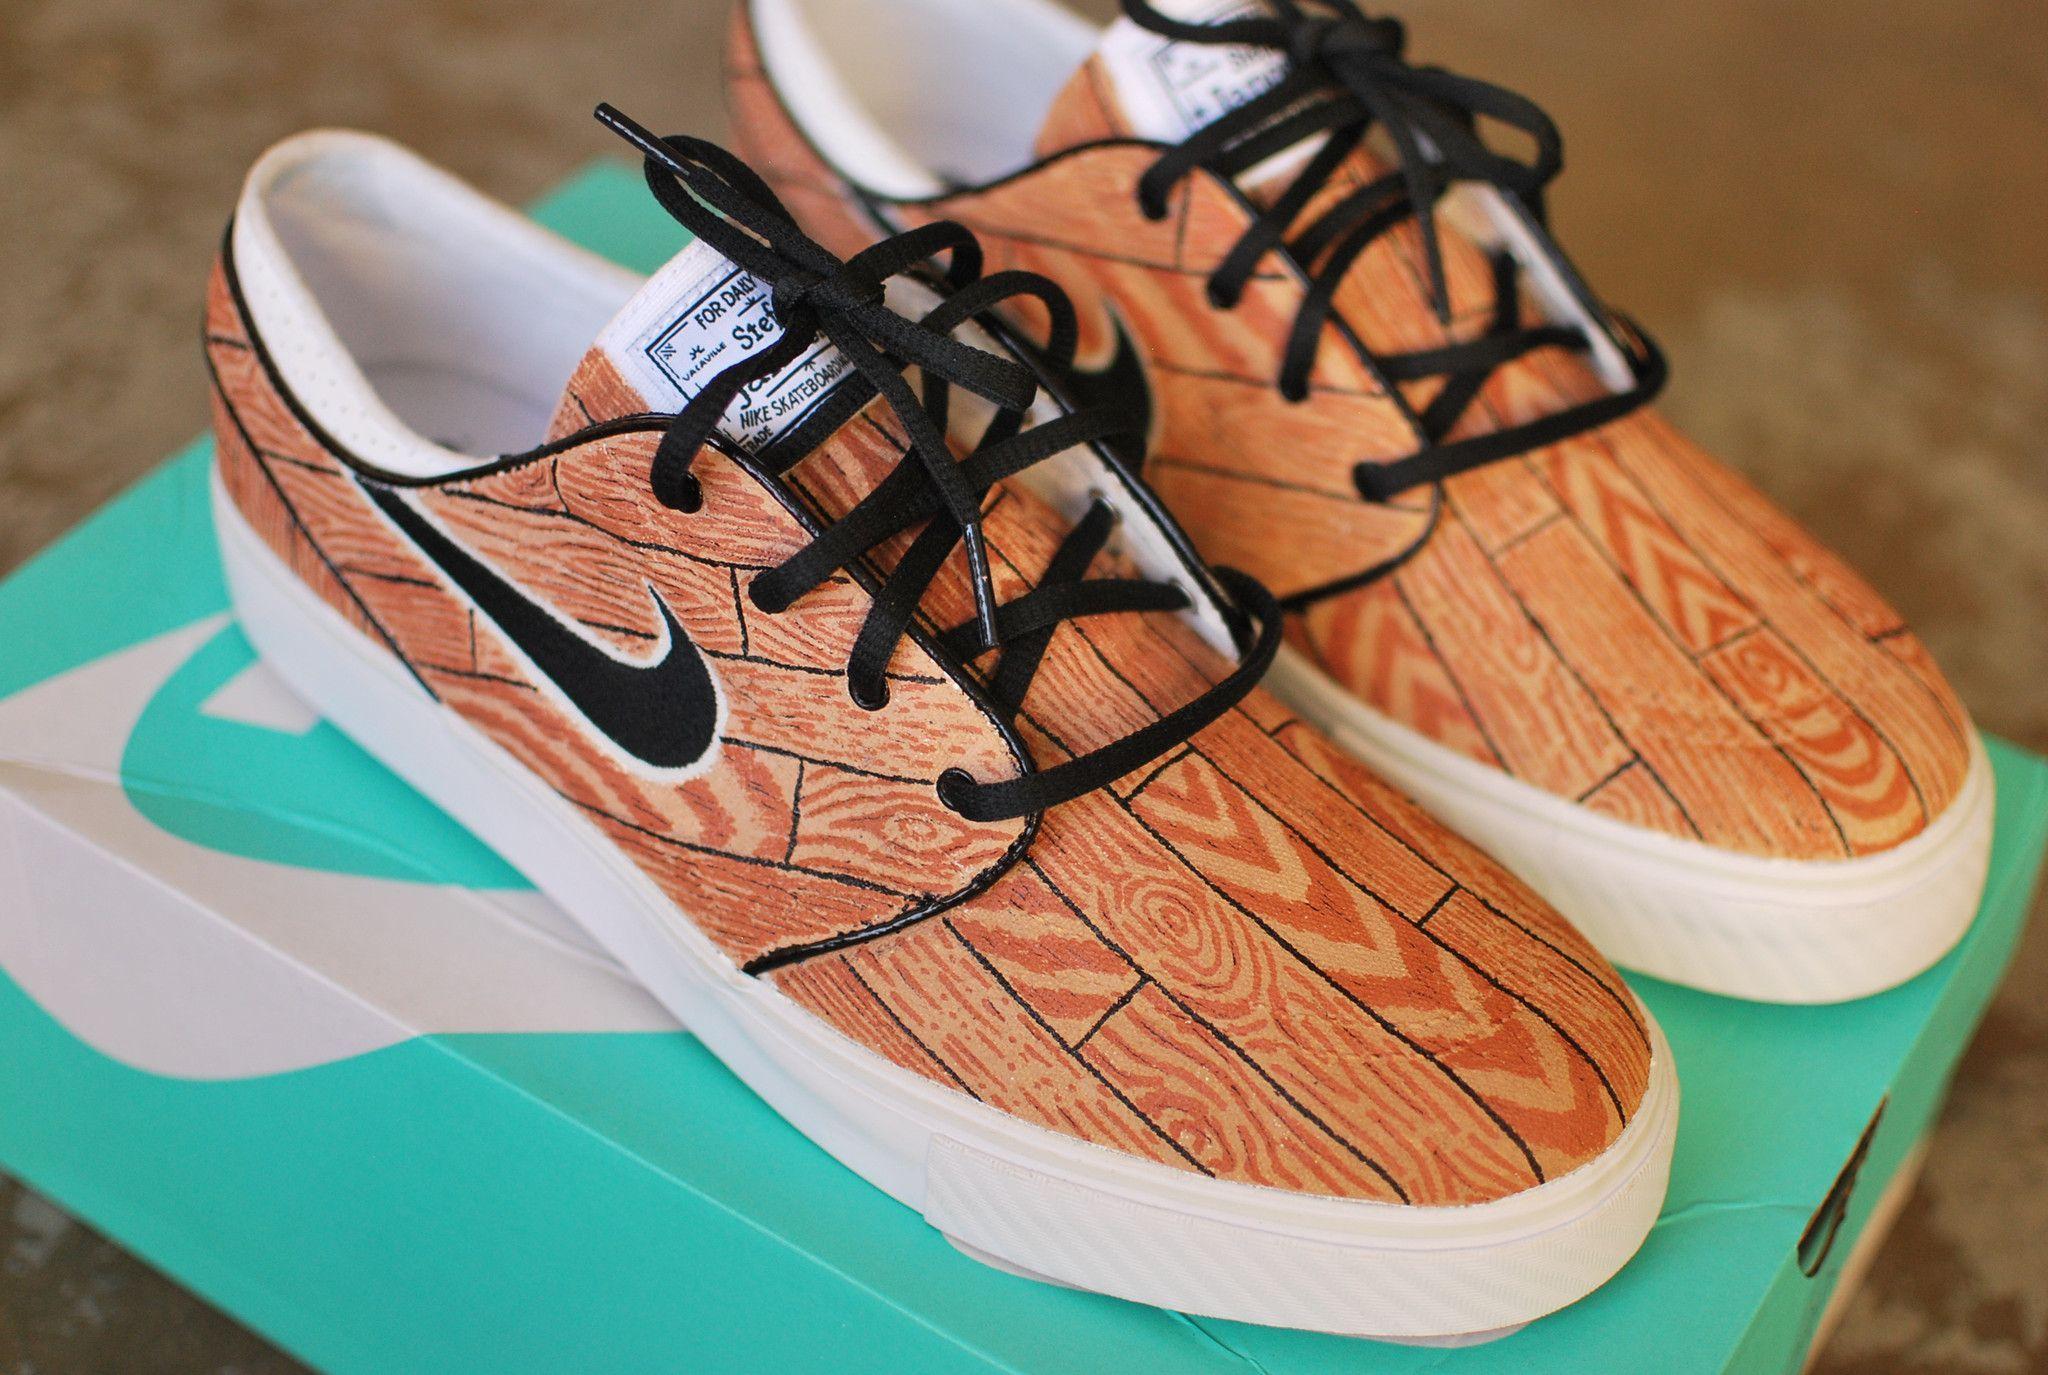 317084da6d These custom Nike Zoom Stefan Janoski skate shoes features my hand painted  woodgrain design. The